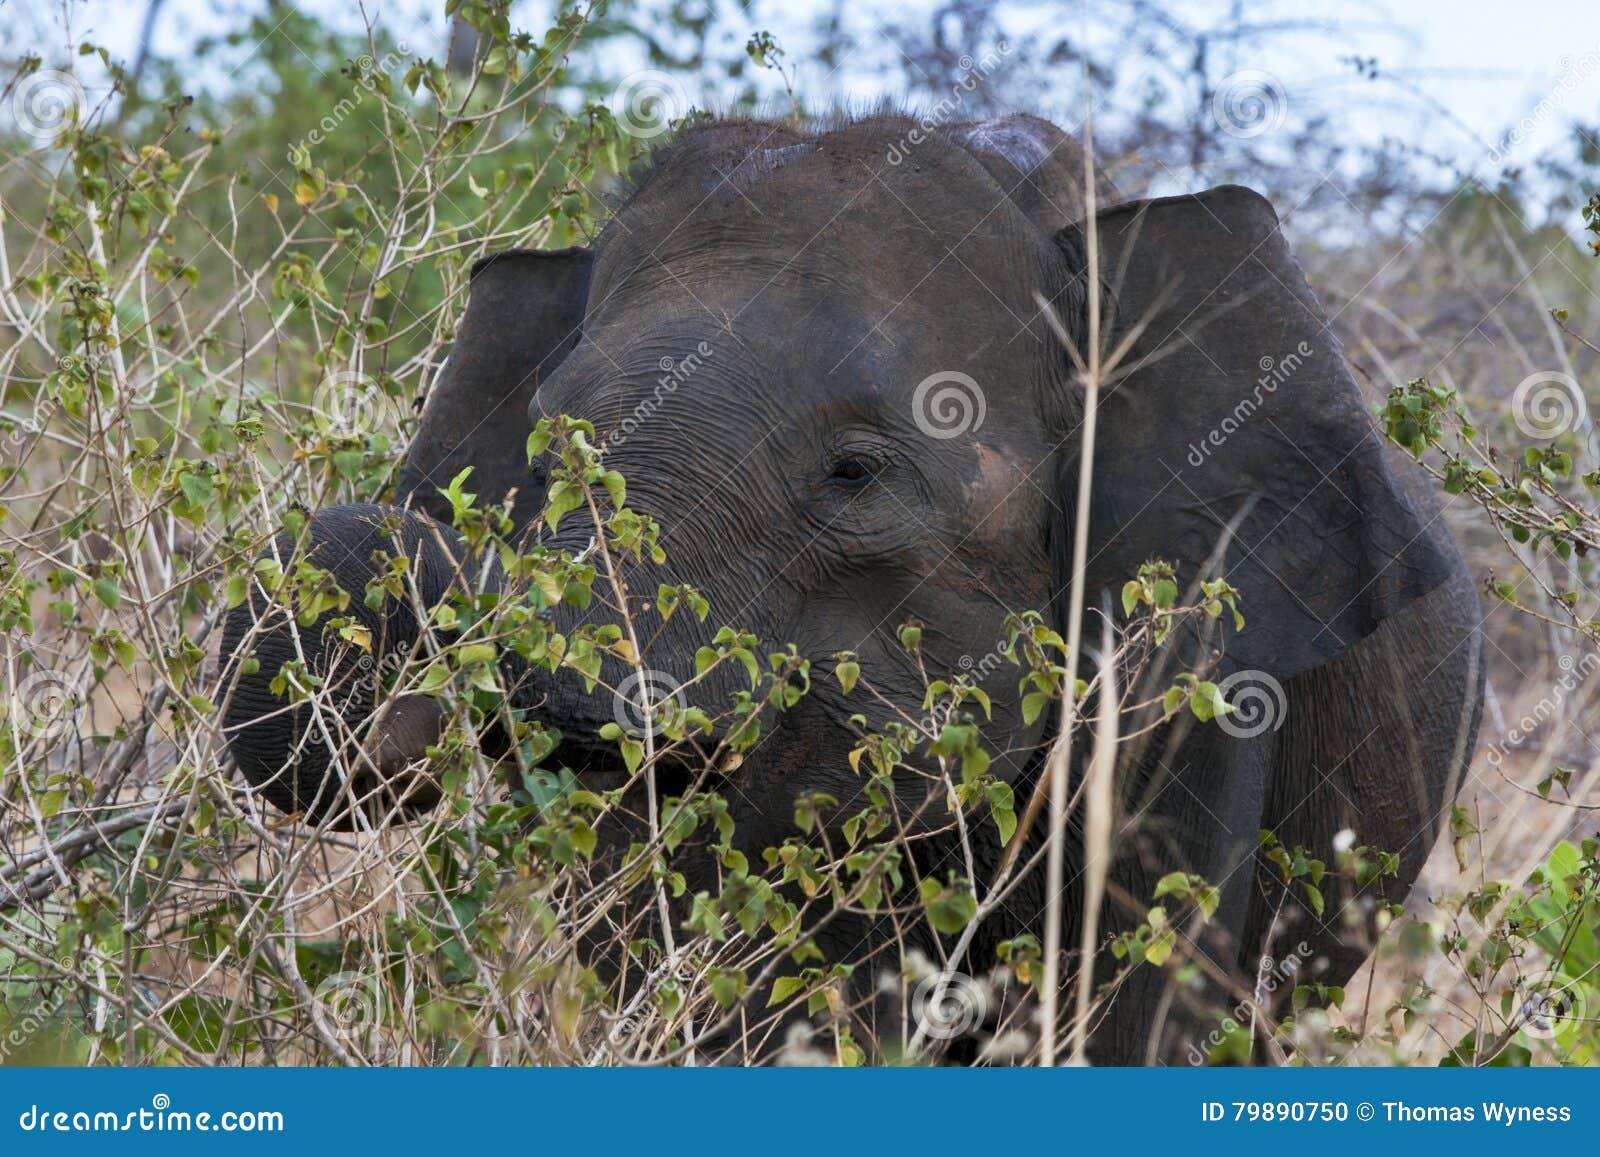 An elephant grazing amongst bushland in the Uda Walawe National Park in Sri Lanka.